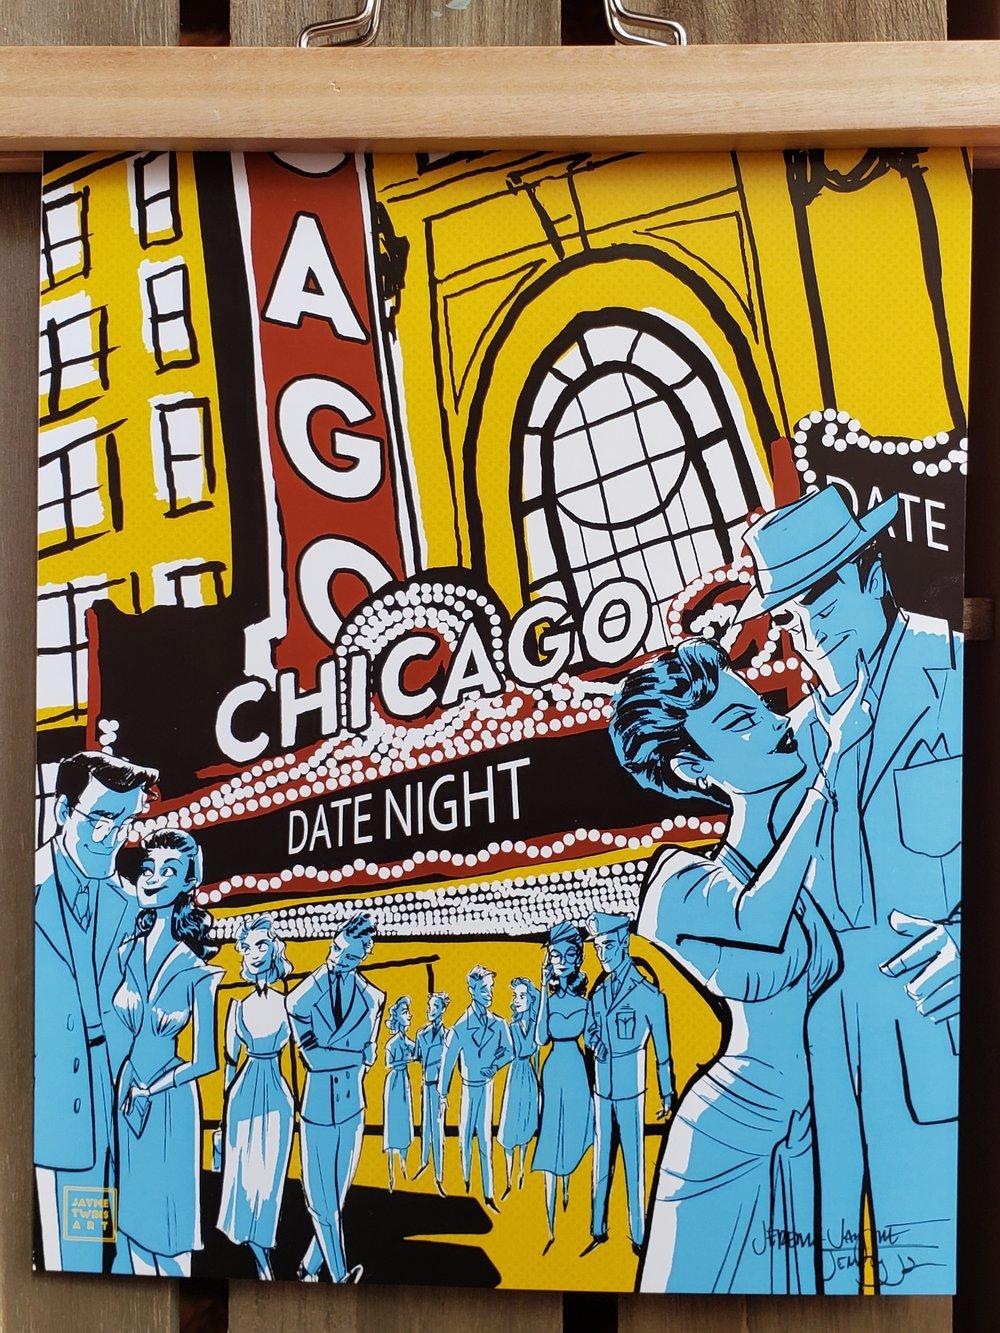 C2E2 2019 Date Night in Chicago